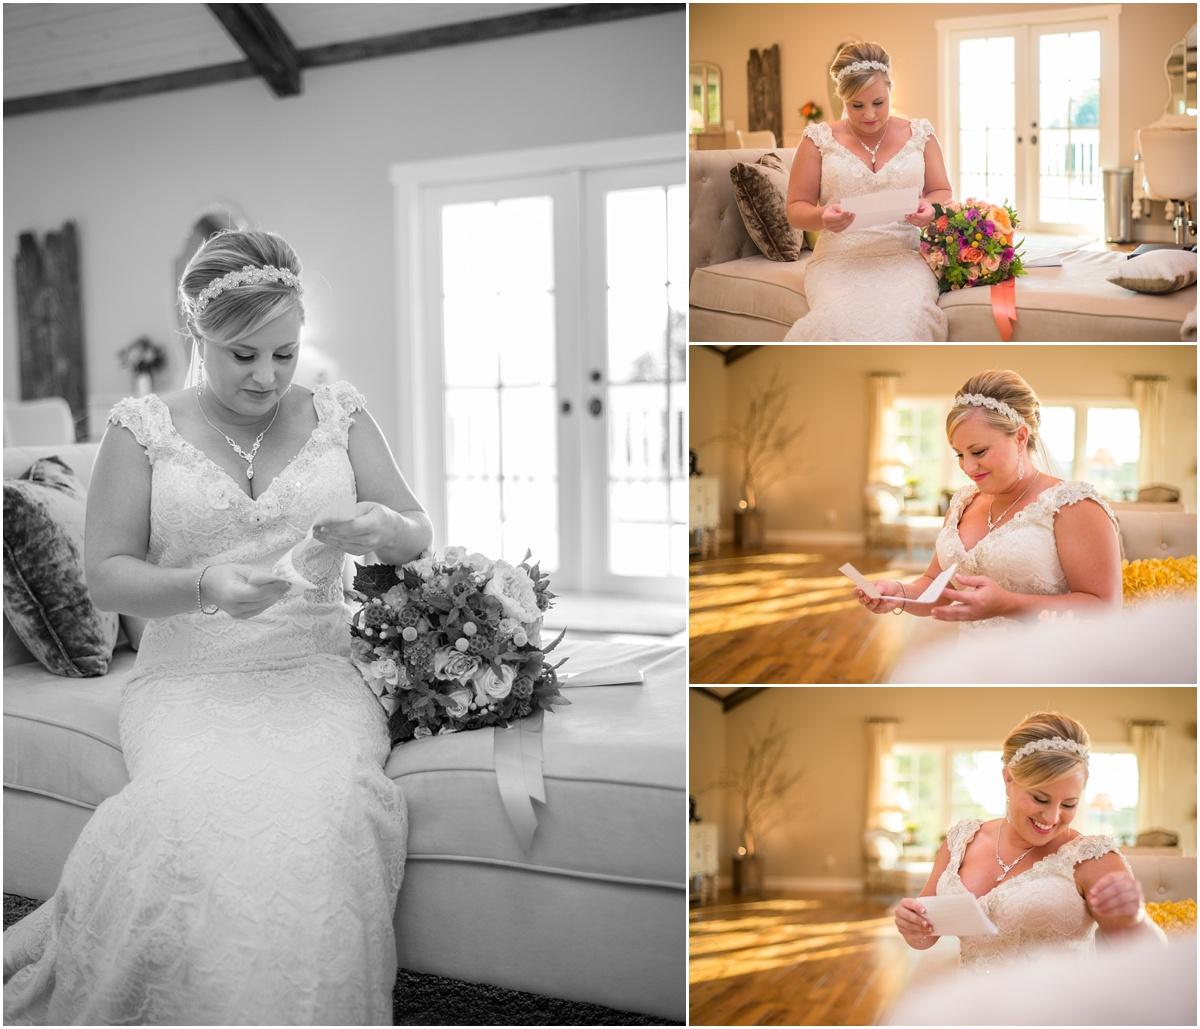 Greg Smit Photography Nashville wedding photographer Mint Springs Farm  9